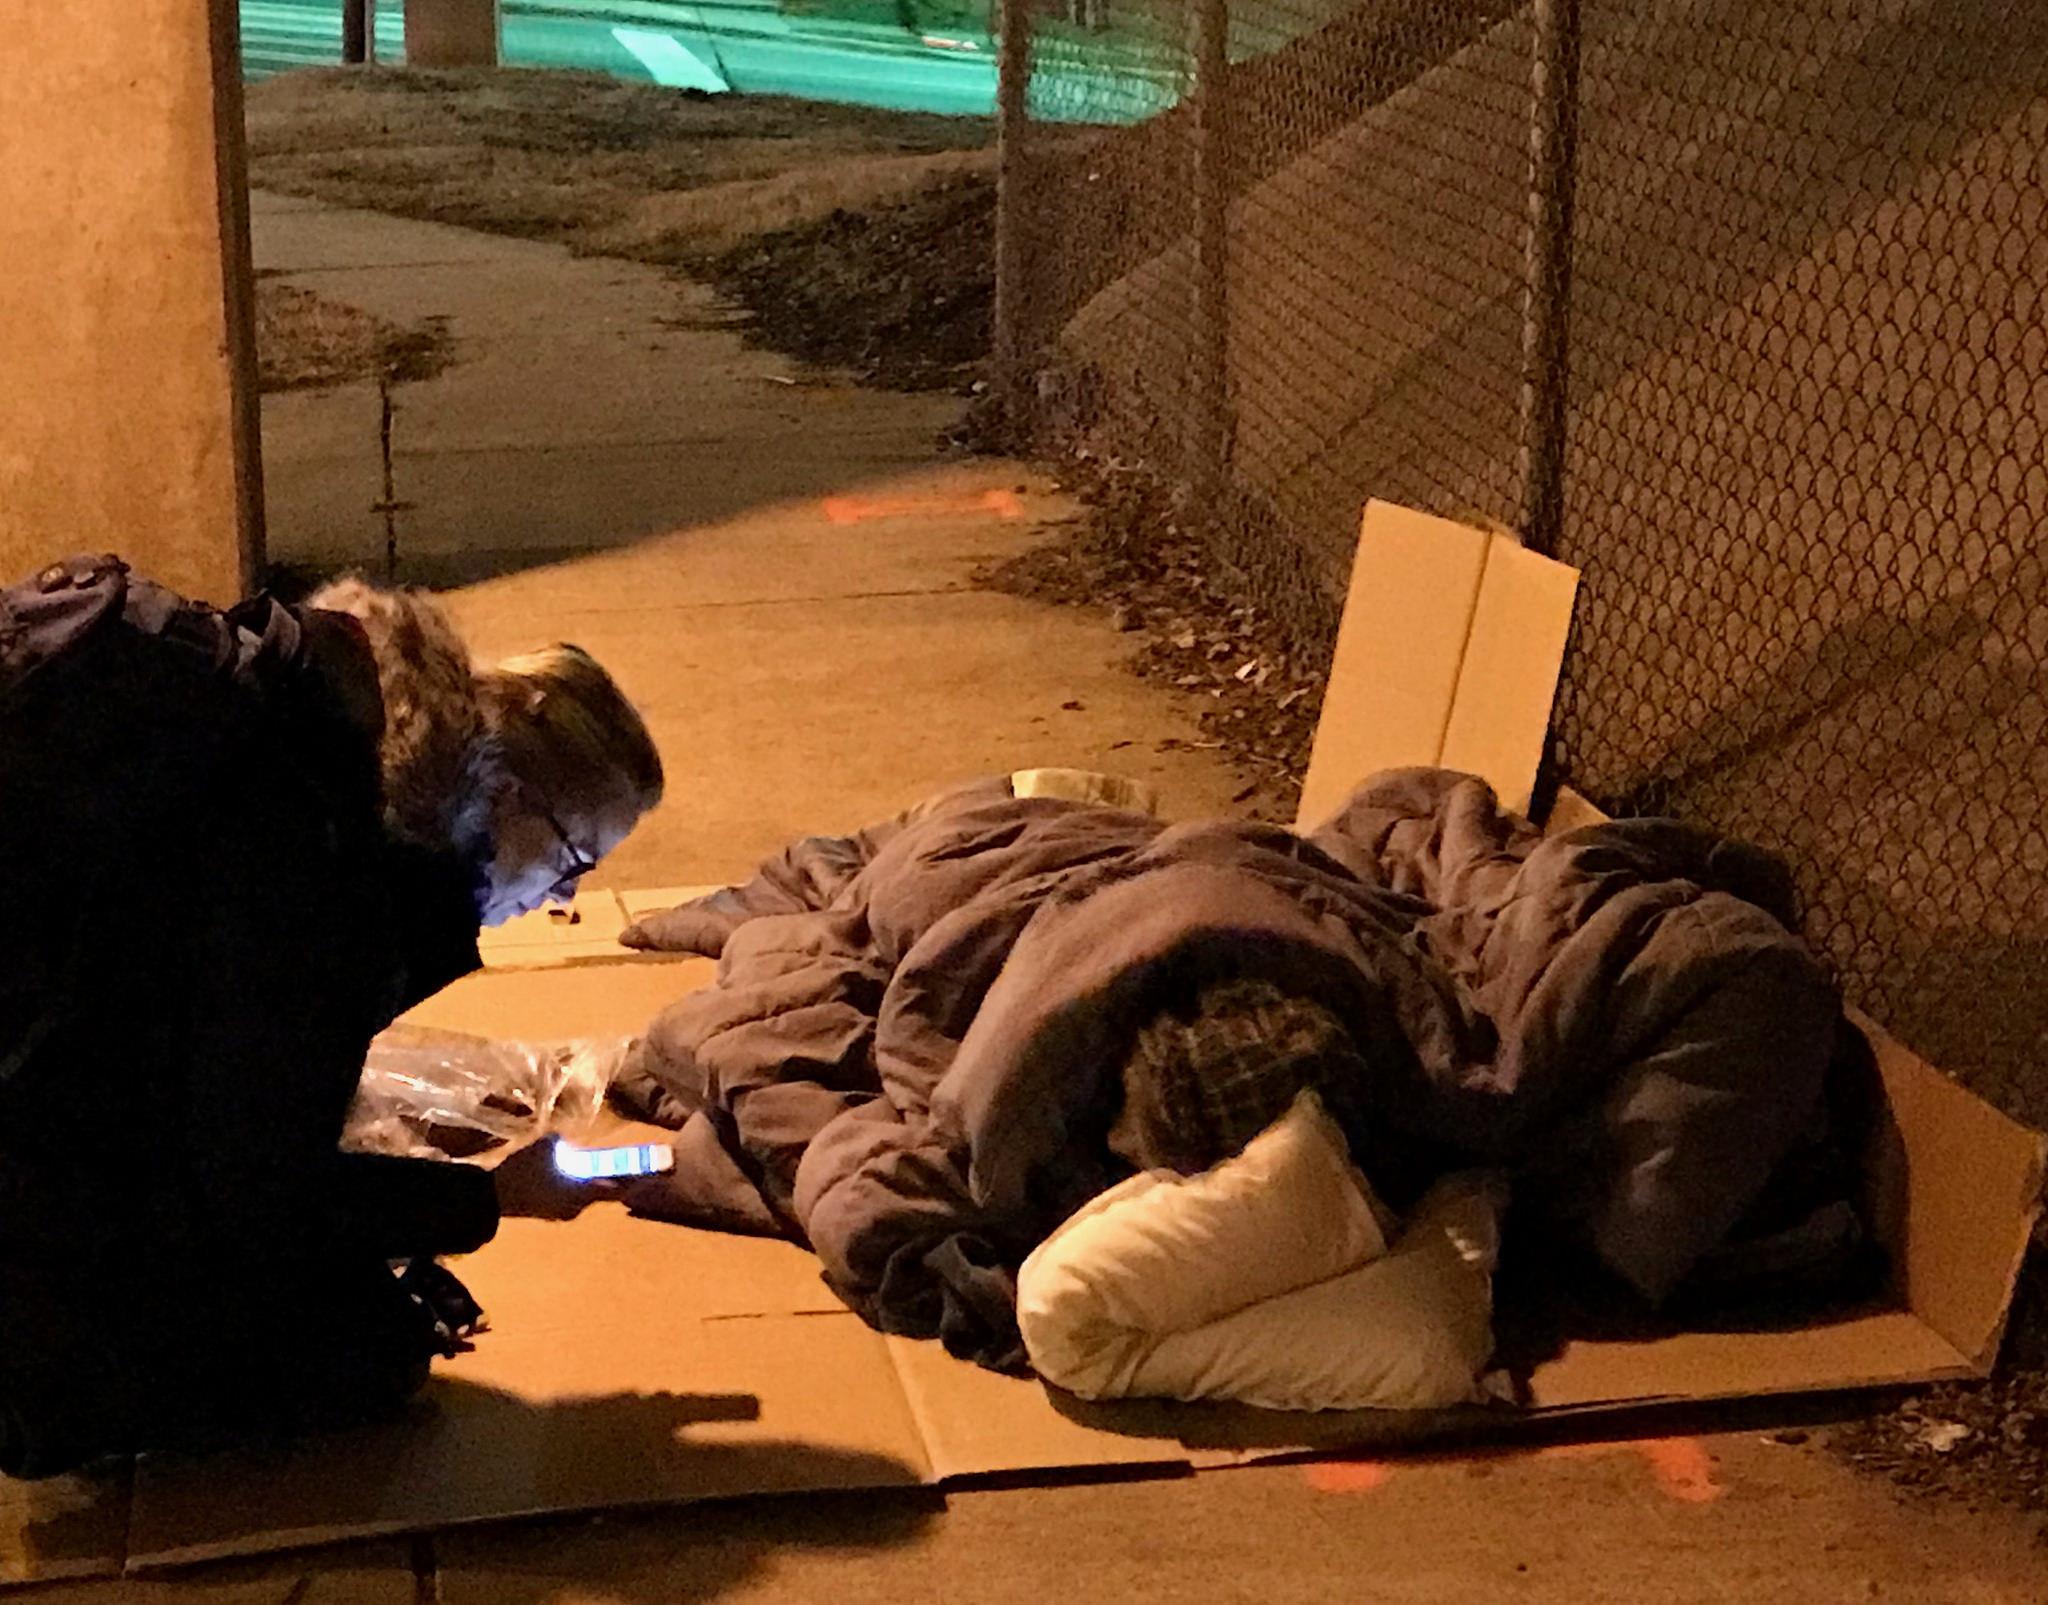 A woman kneeling next to a homeless man sleeping outside